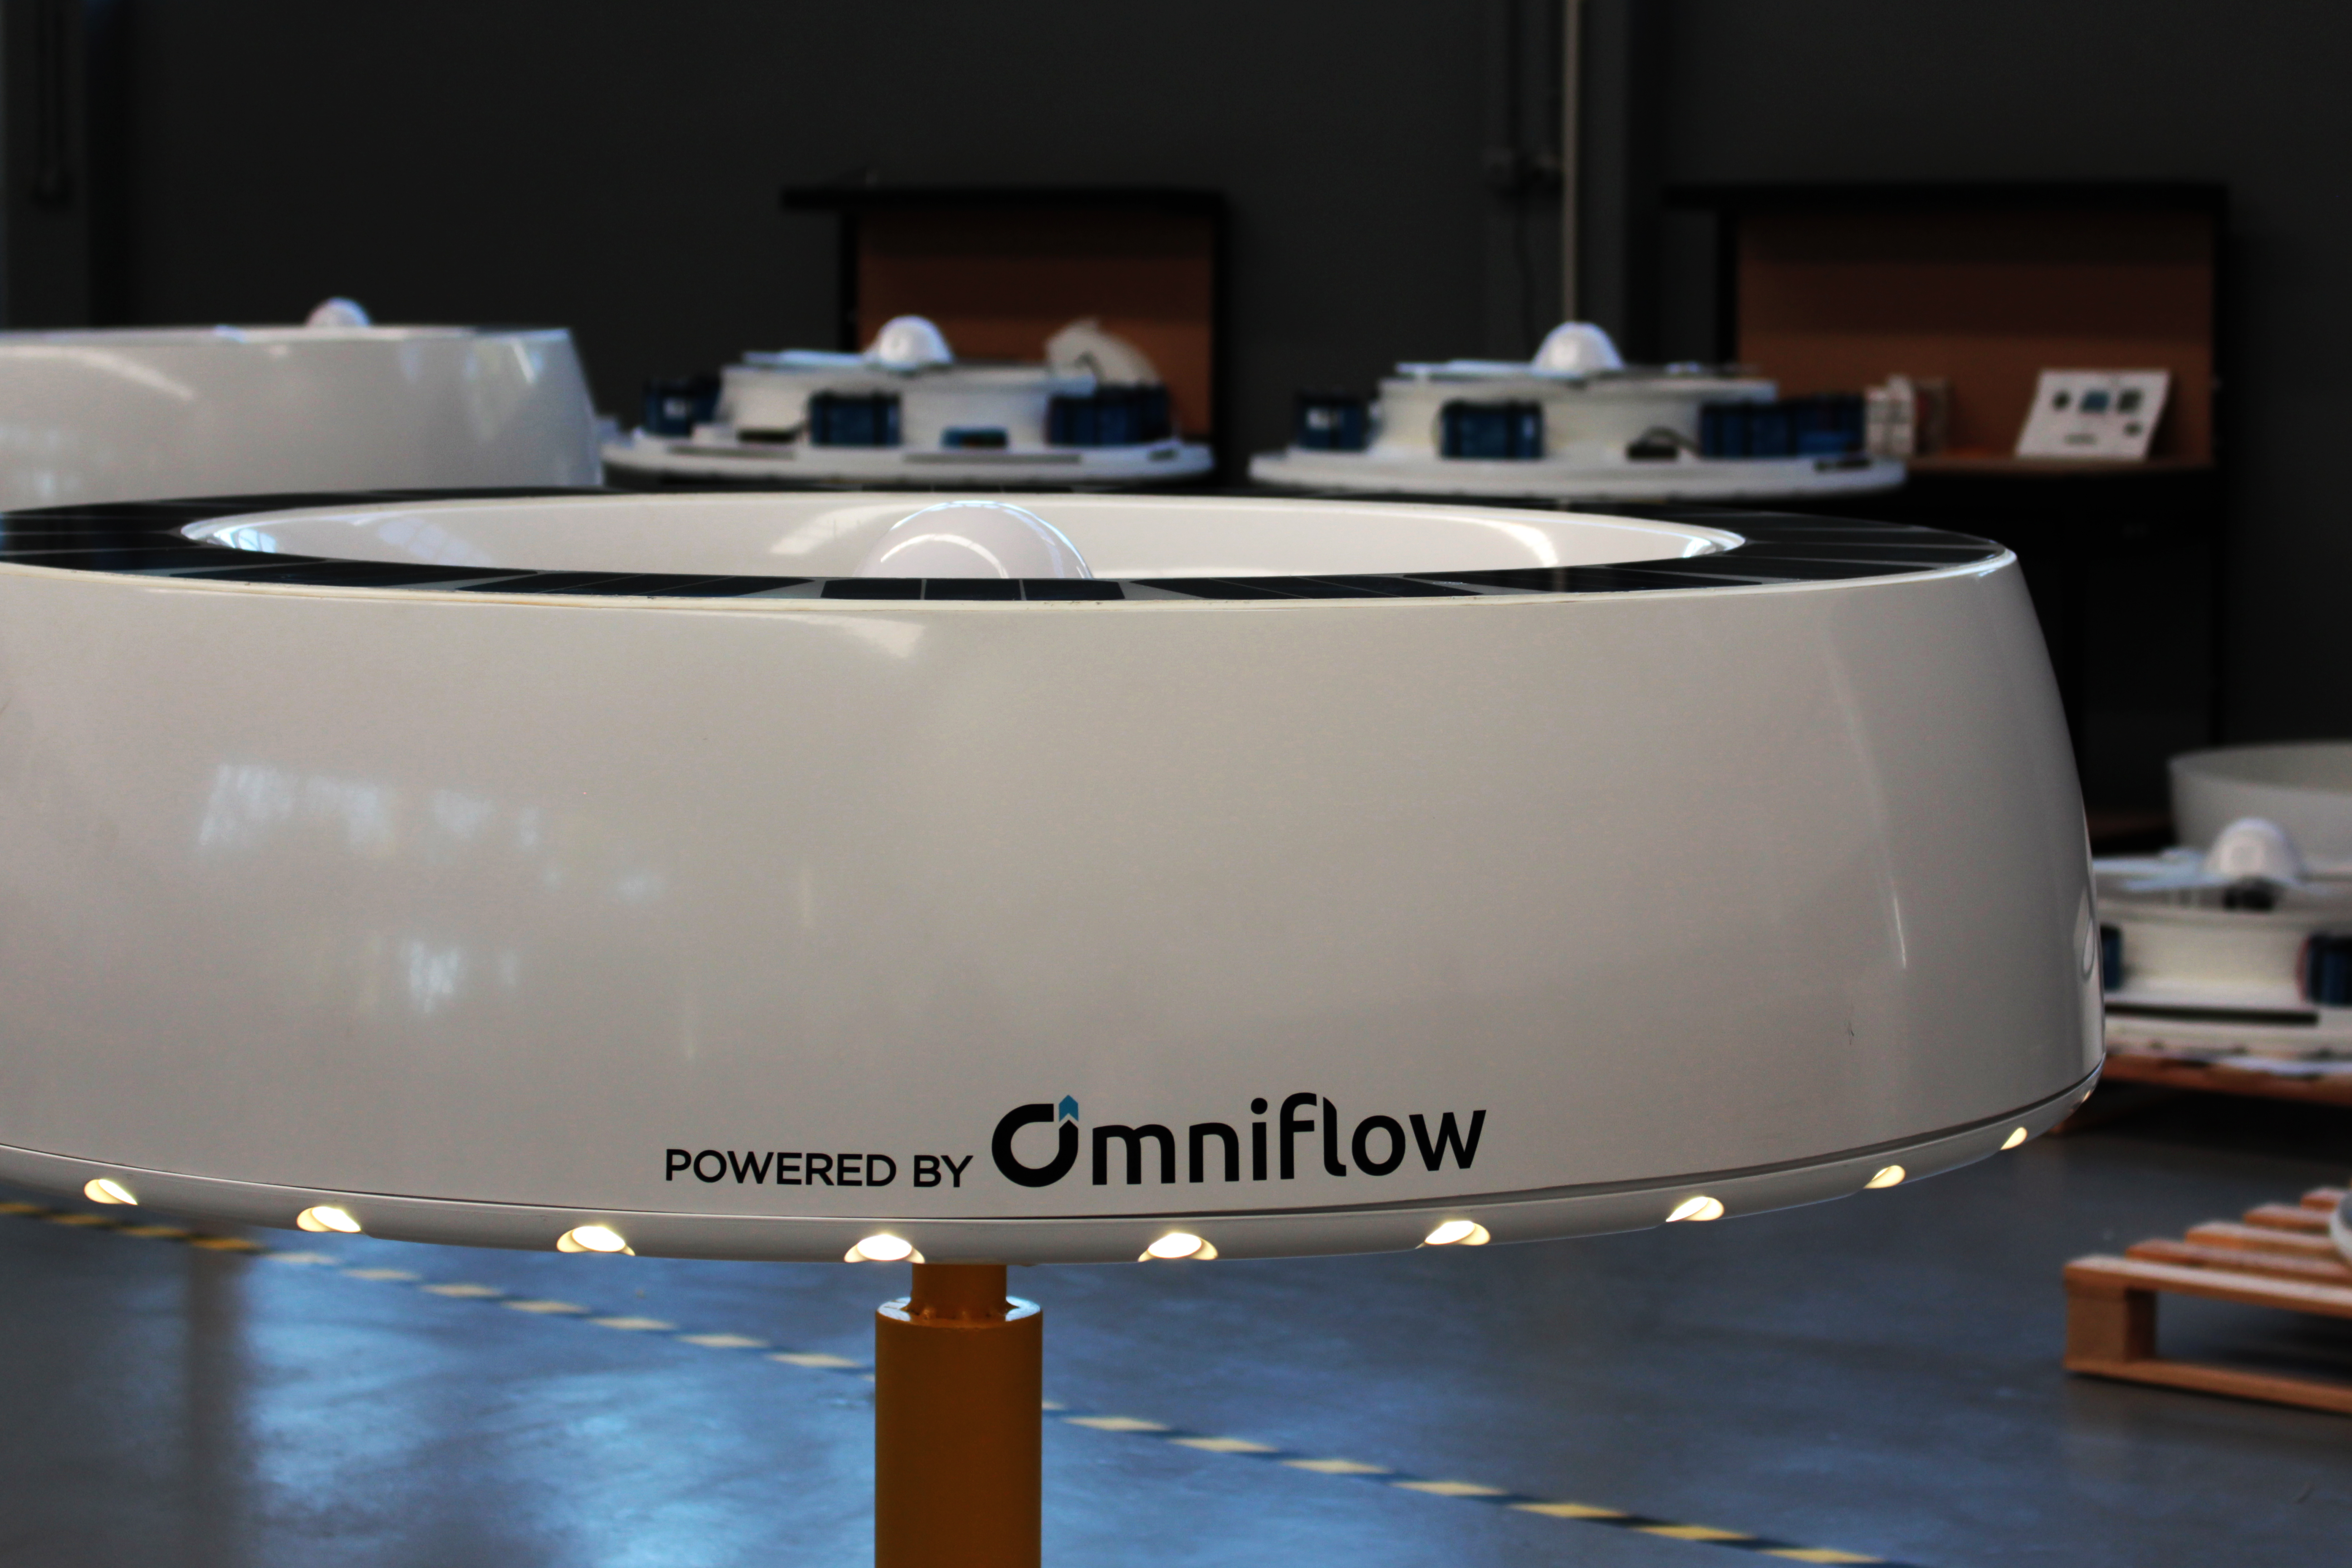 Vão ser instalados dez dispositivos da Omnifllow no Polo da Asprela.